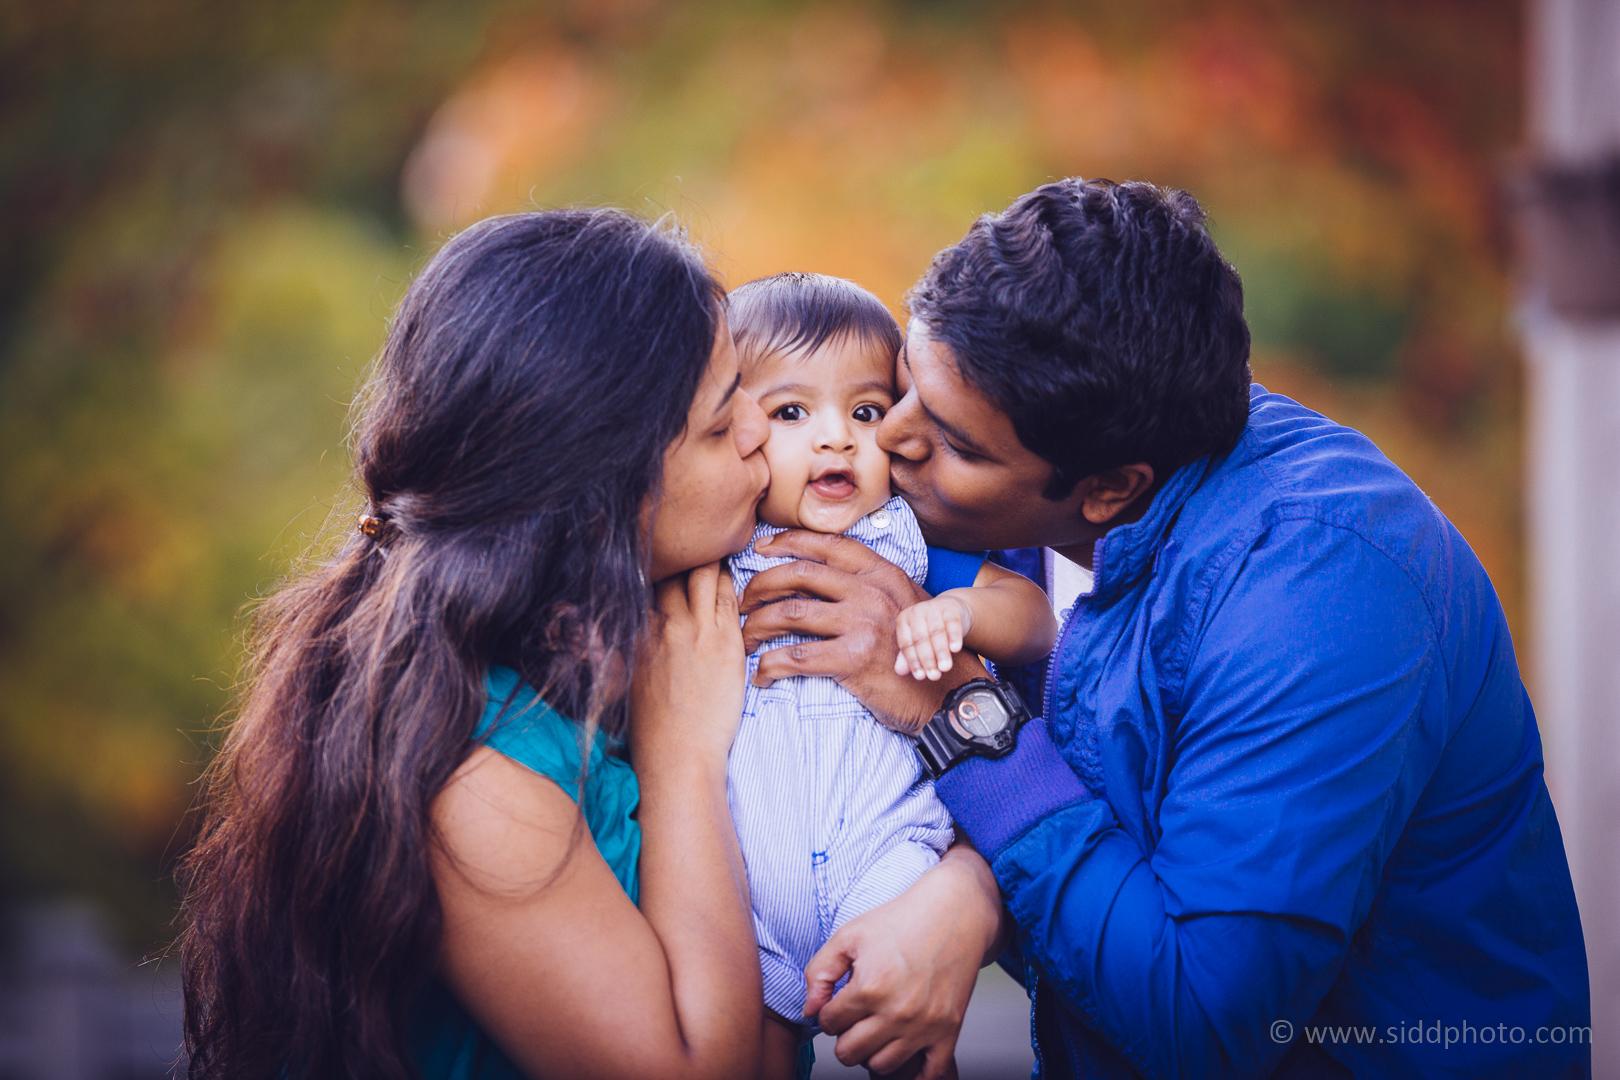 2014-10-18 - Deepthi Parthu Family - _O5C5981